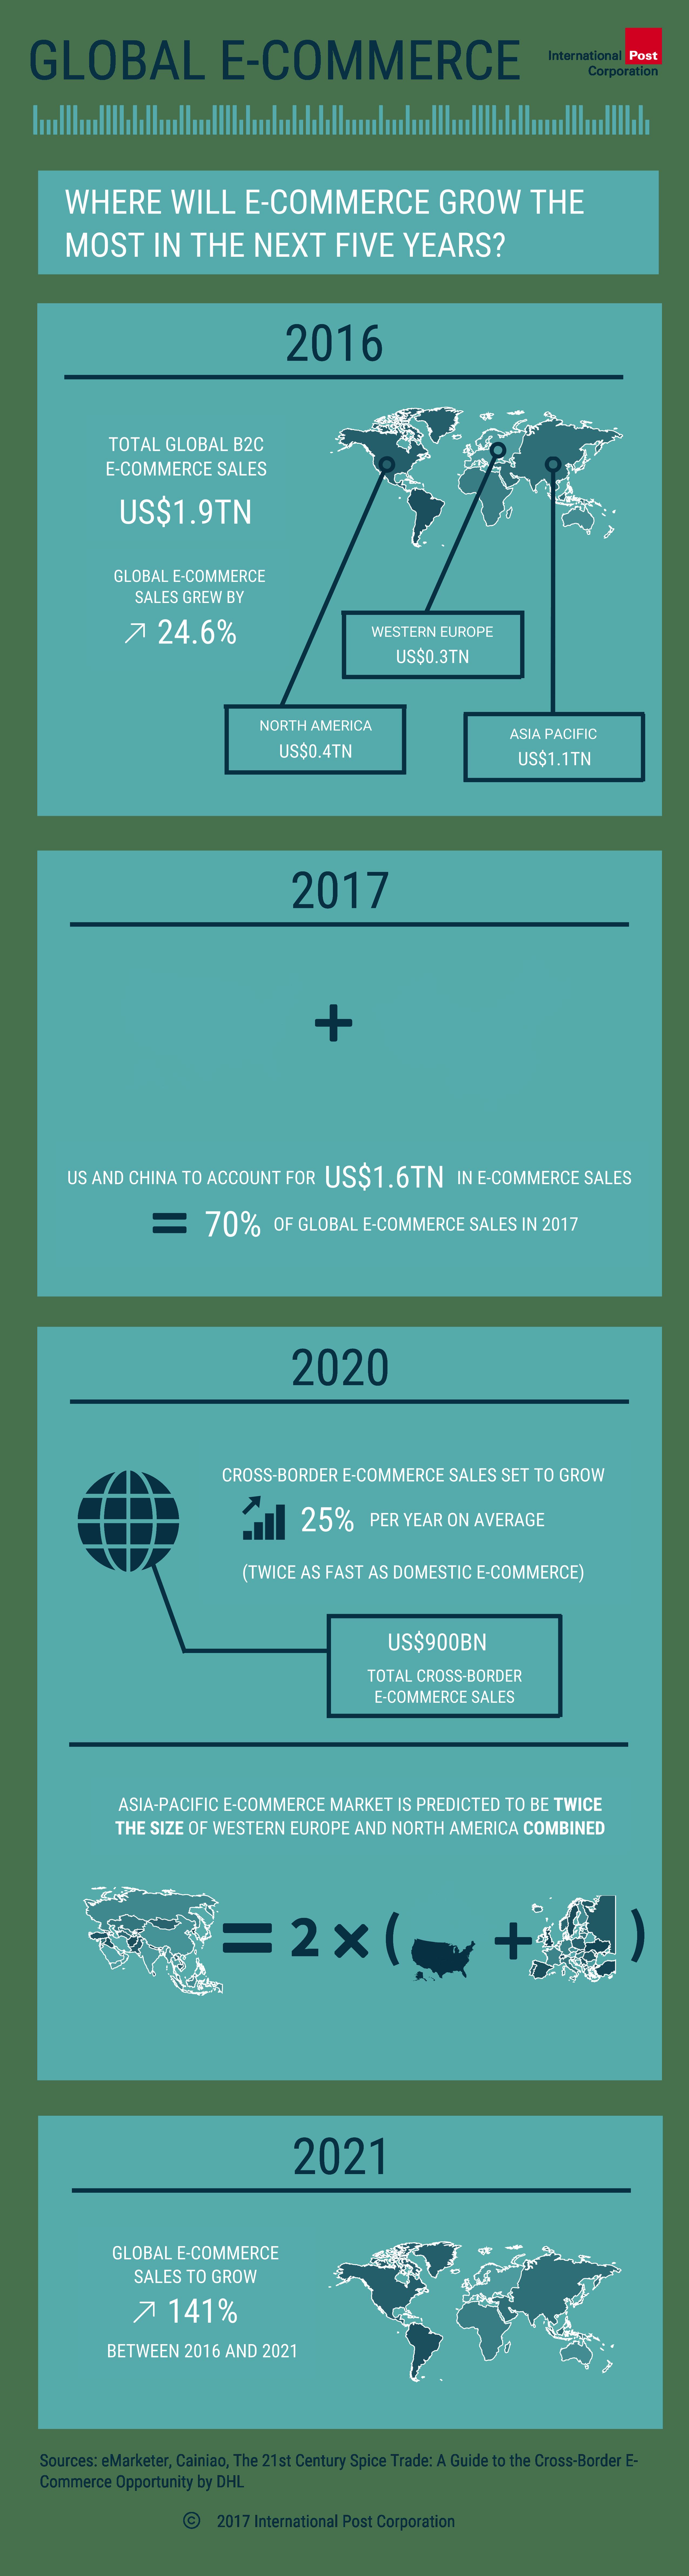 Global e-commerce trends 2016-21